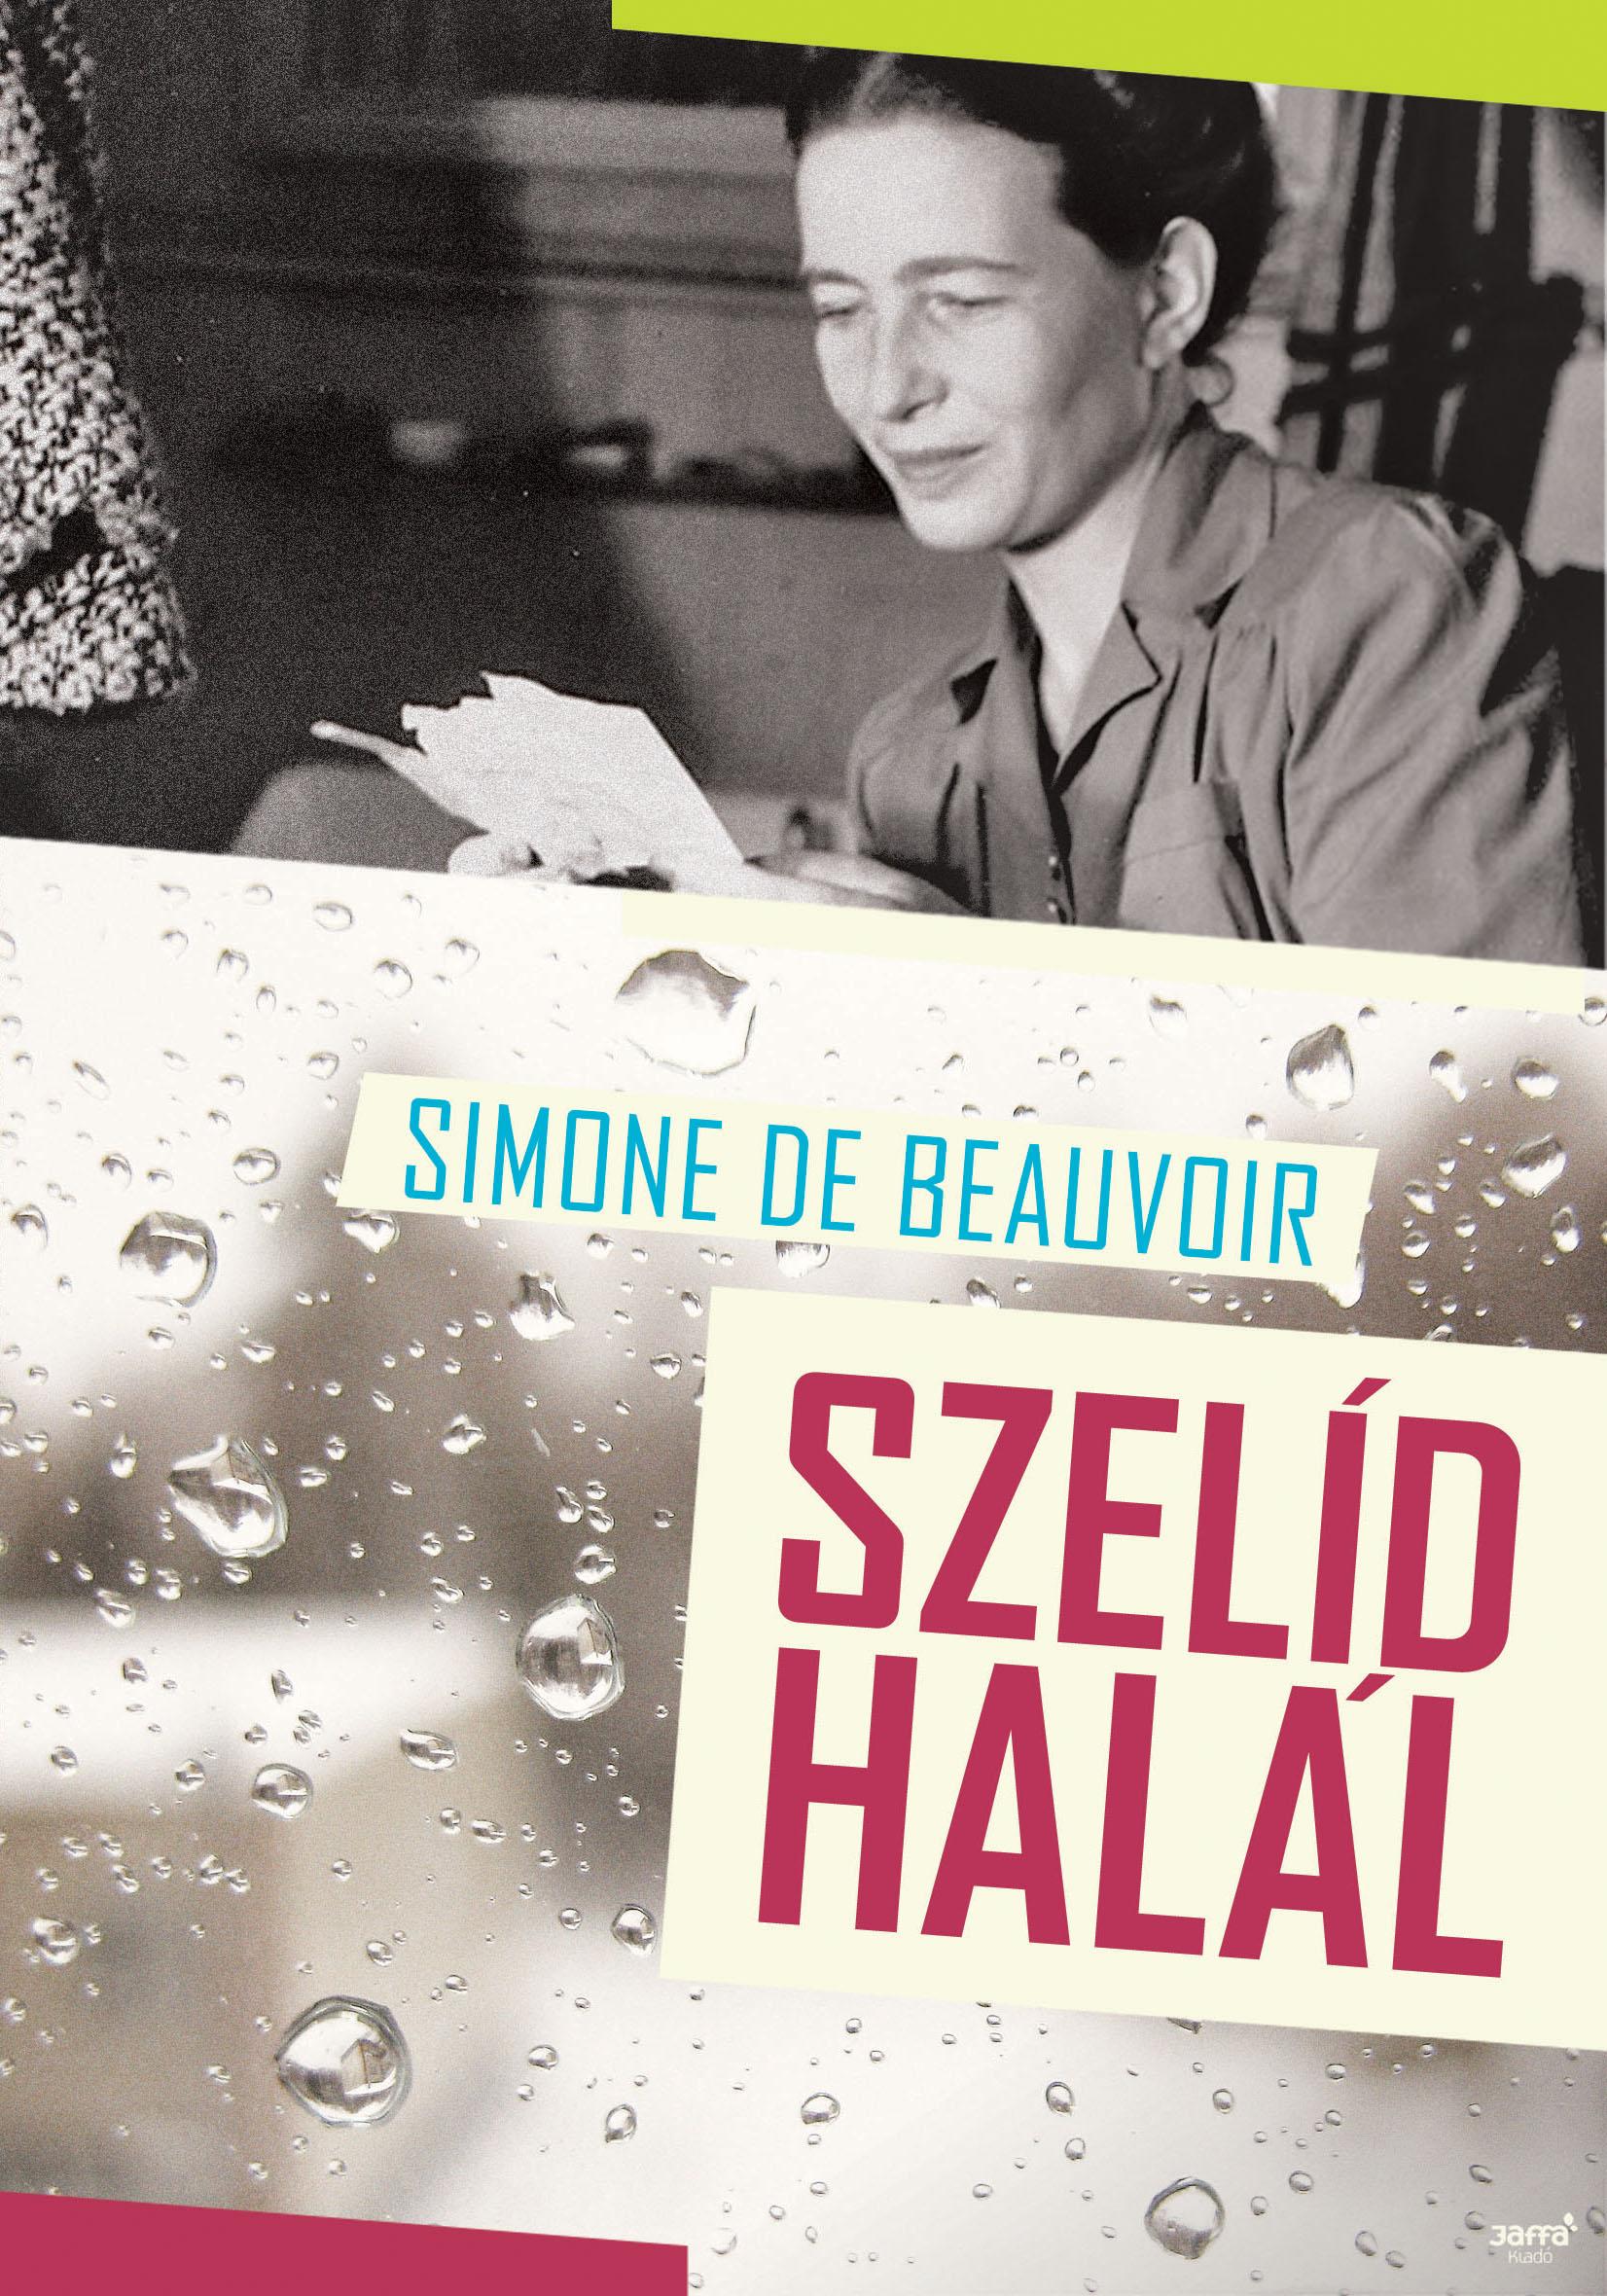 simone_de_beauvoir_szelid_halal_b1.jpg